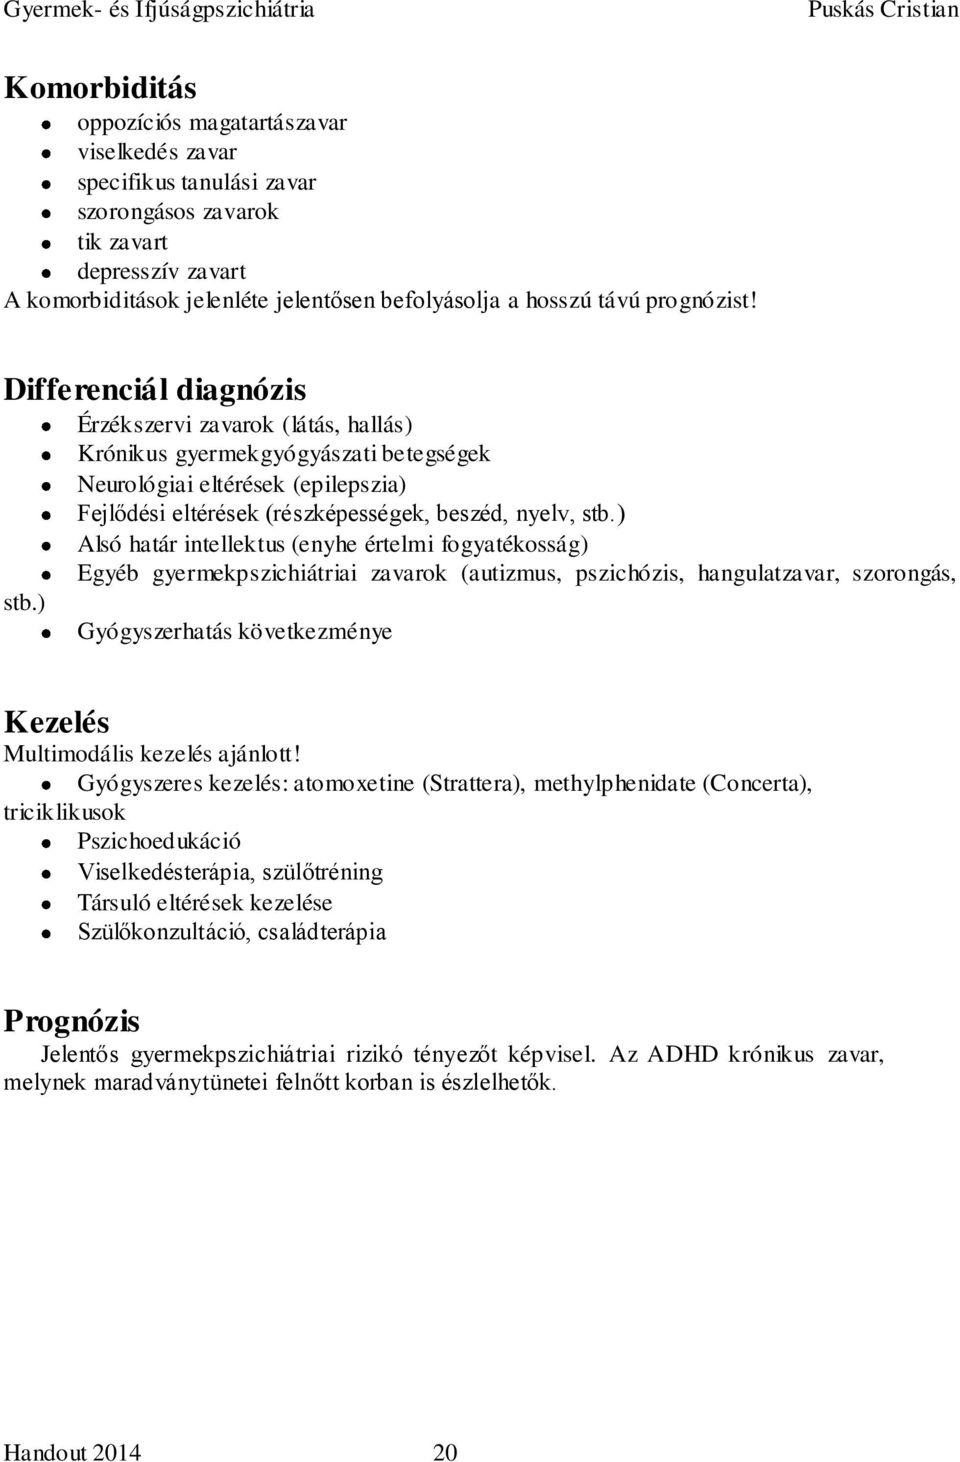 légzési papillomatosis diagnózis